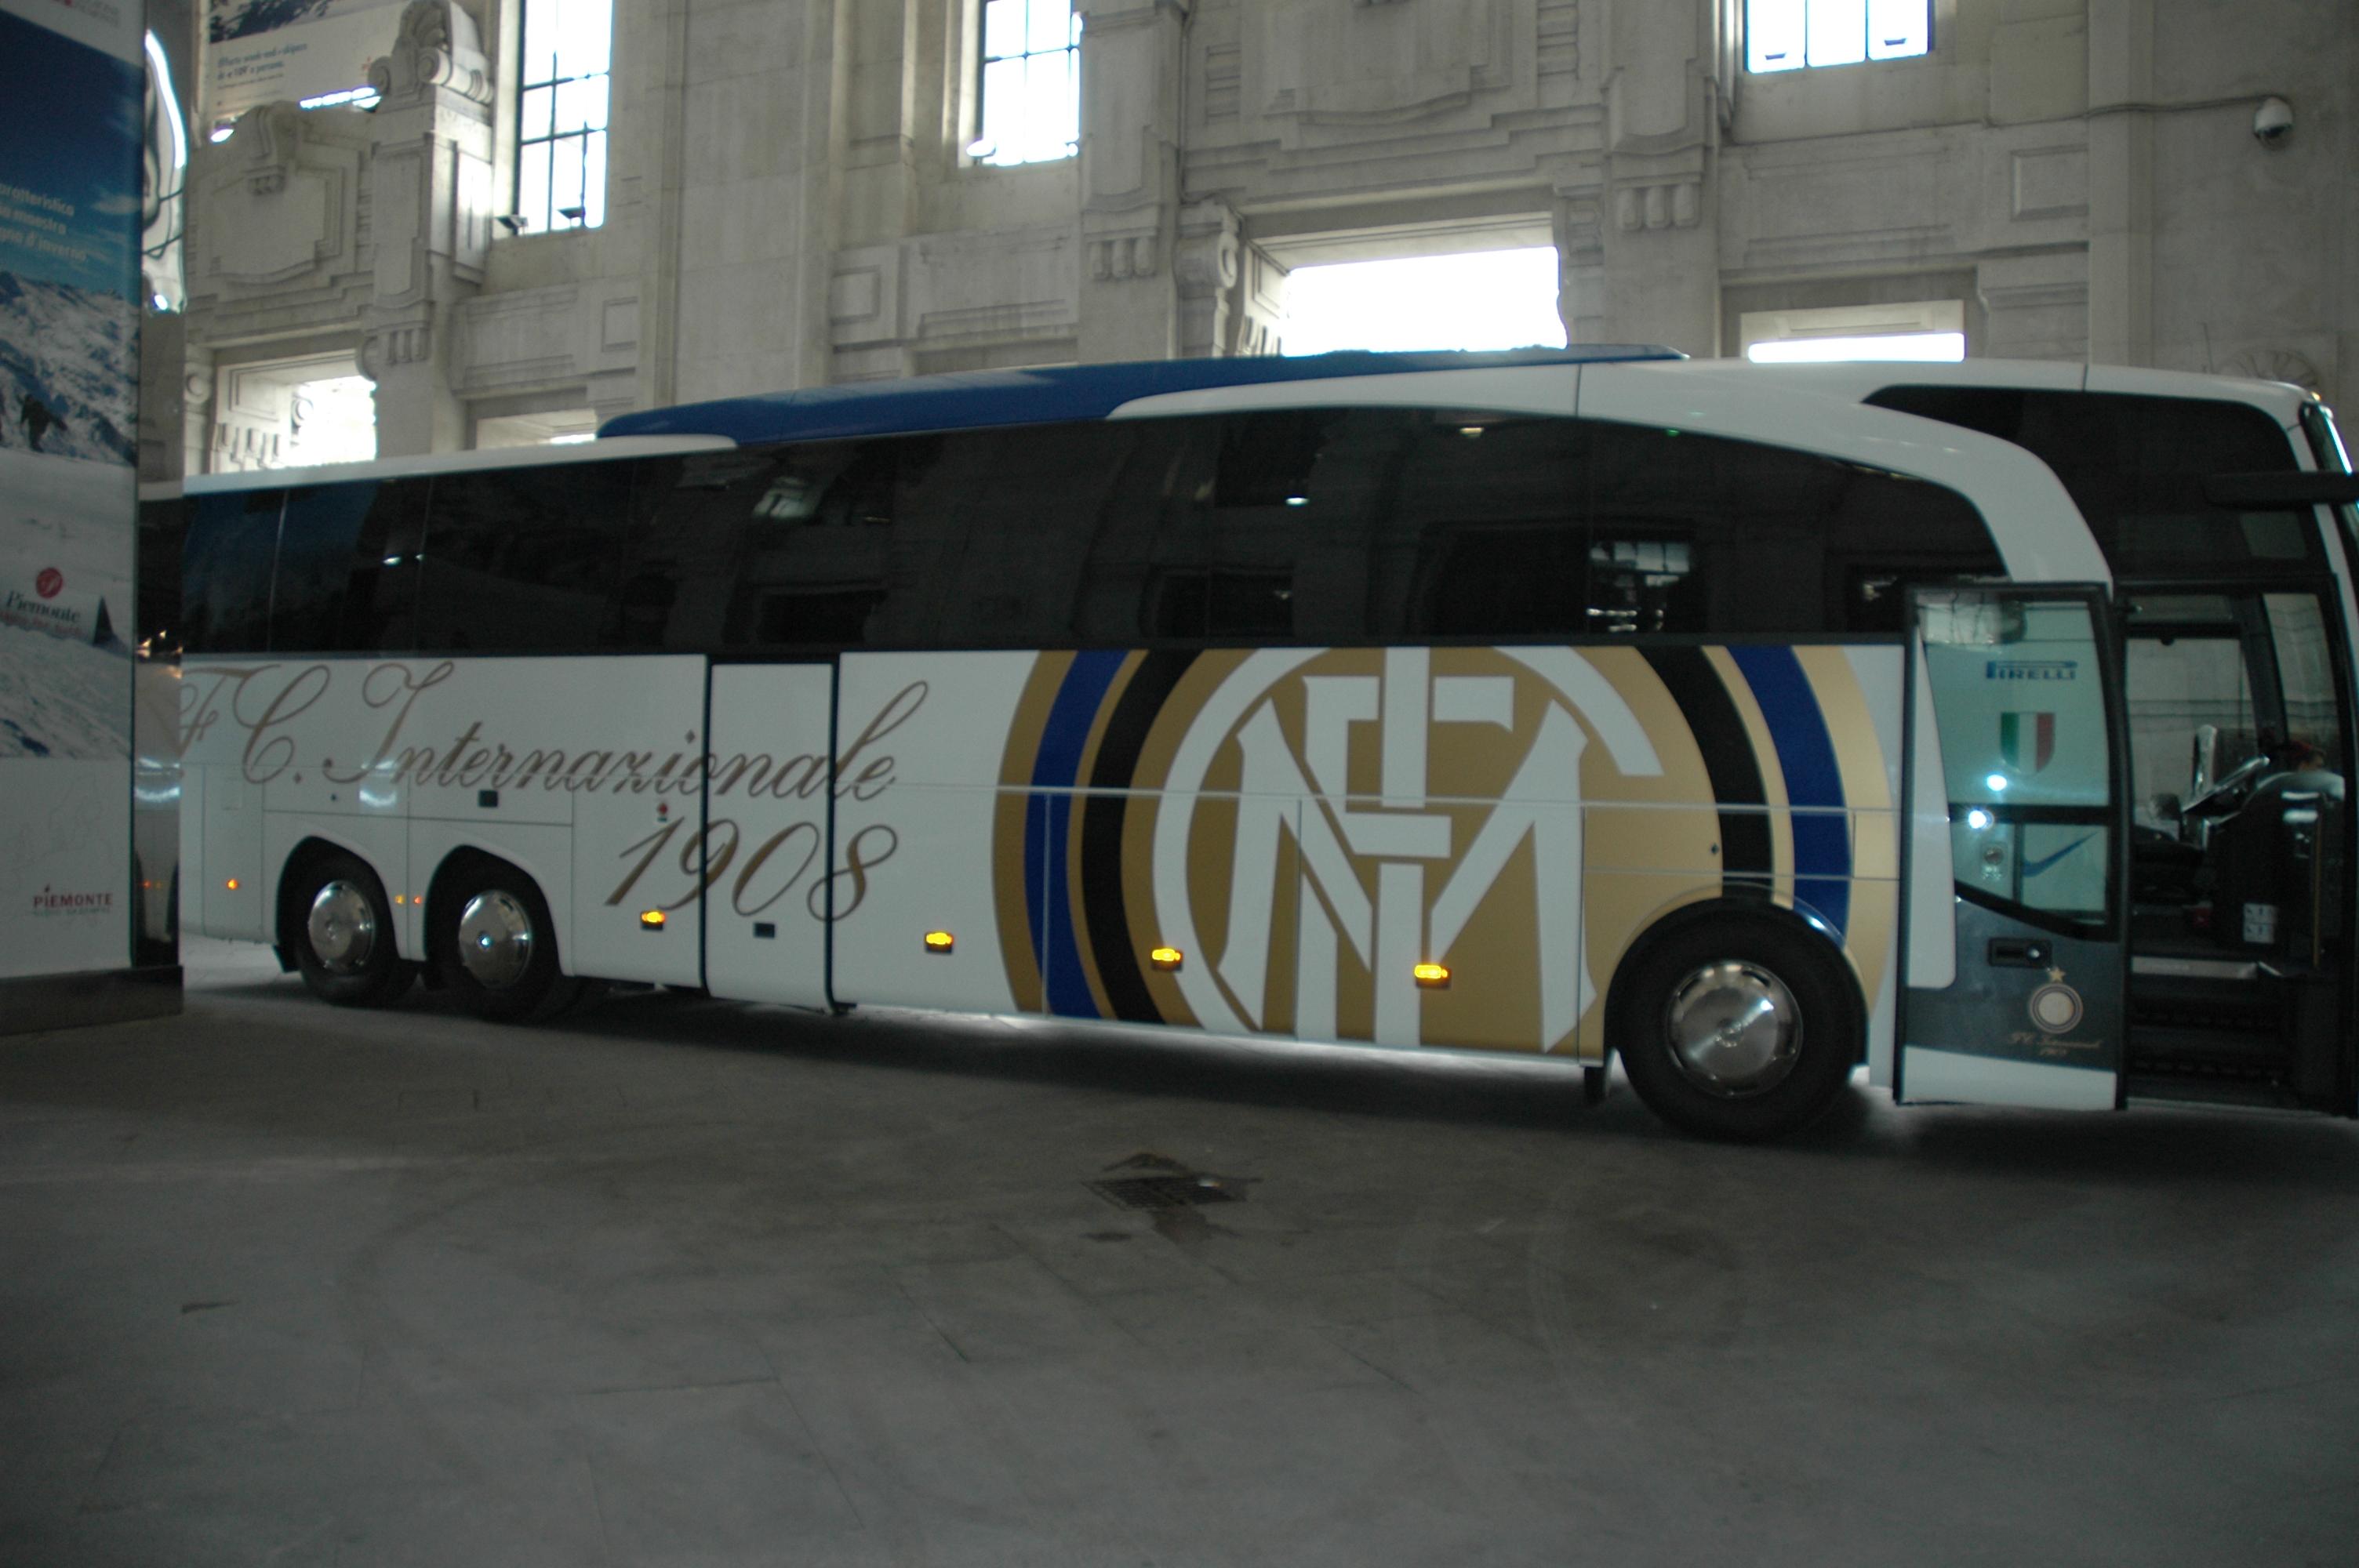 2010 Aprile 171 Calcio E Parole